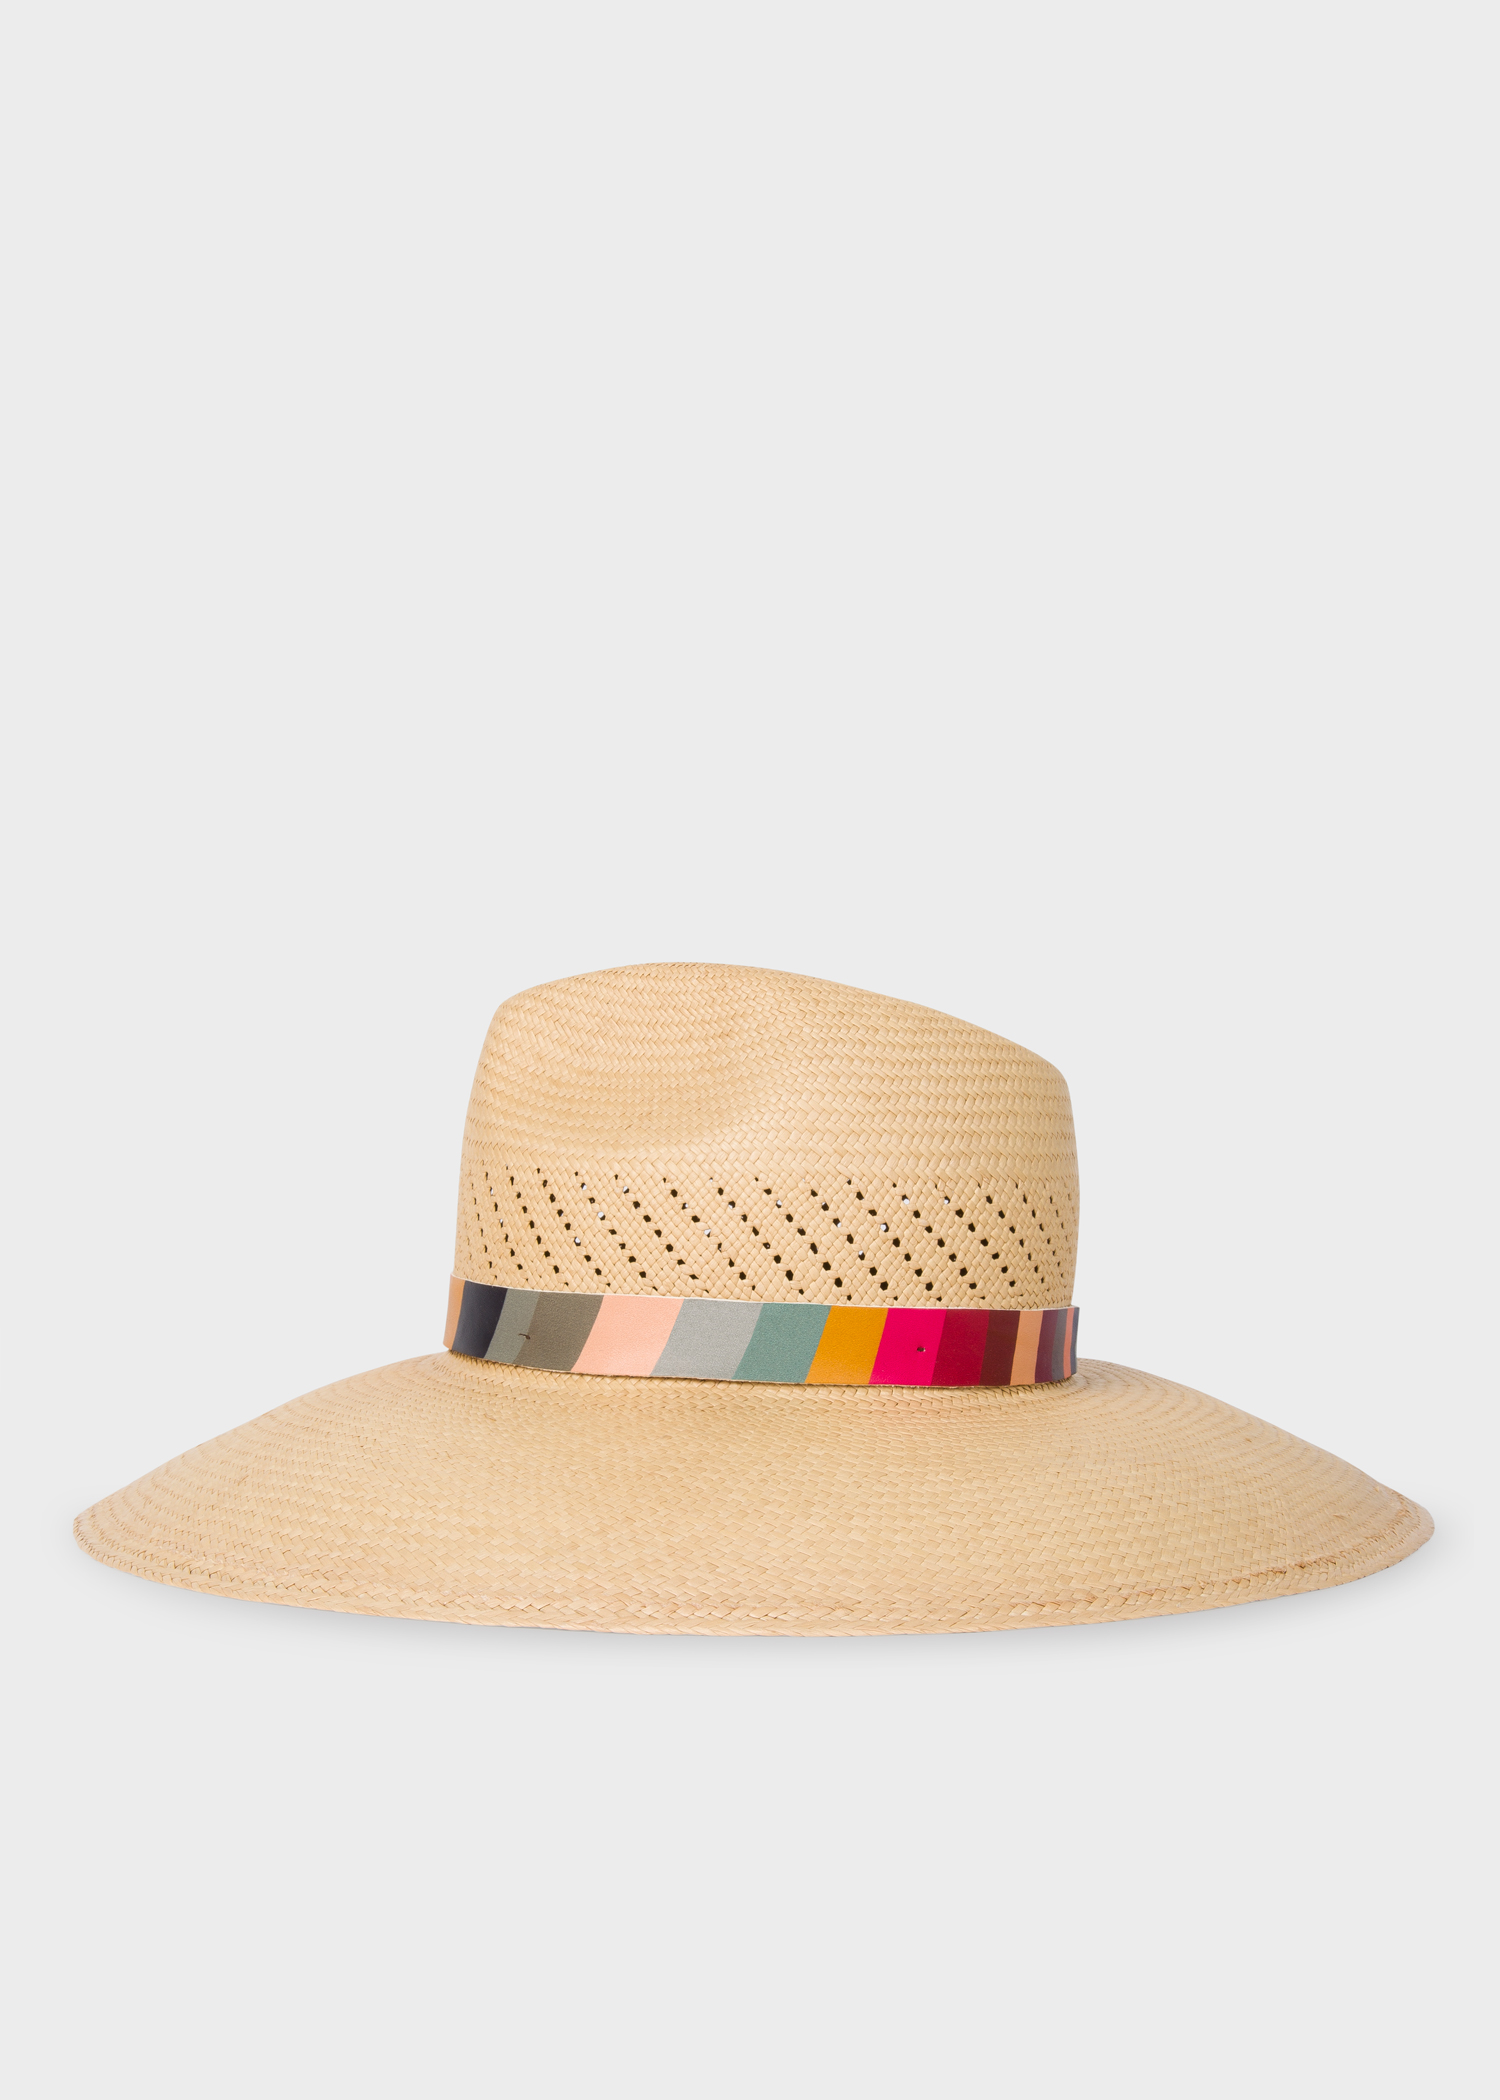 6ae860d9 Side view - Women's 'Swirl' Band Woven Panama Hat Paul Smith